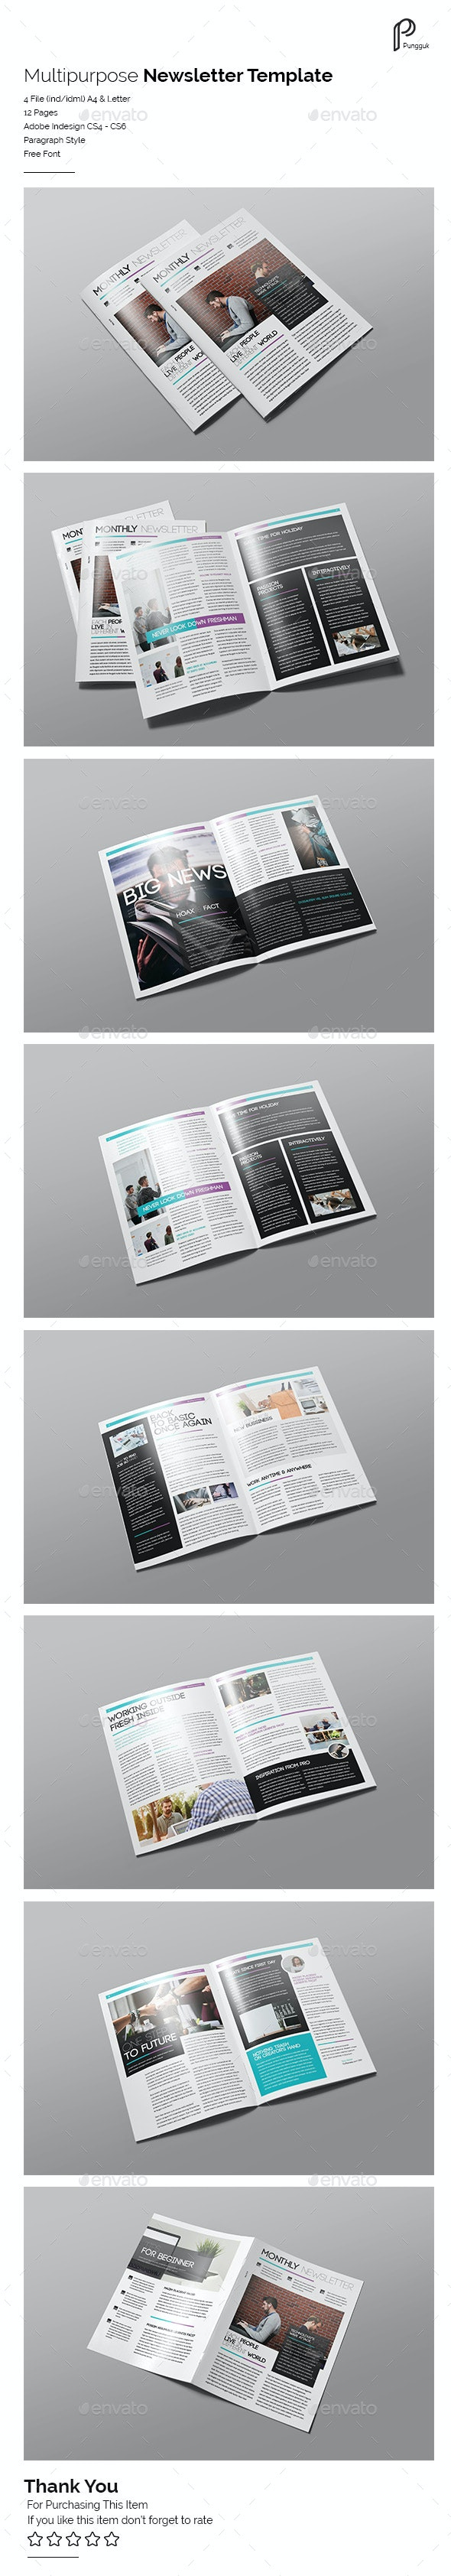 Multipurpose Newsletter Vol.5 - Newsletters Print Templates